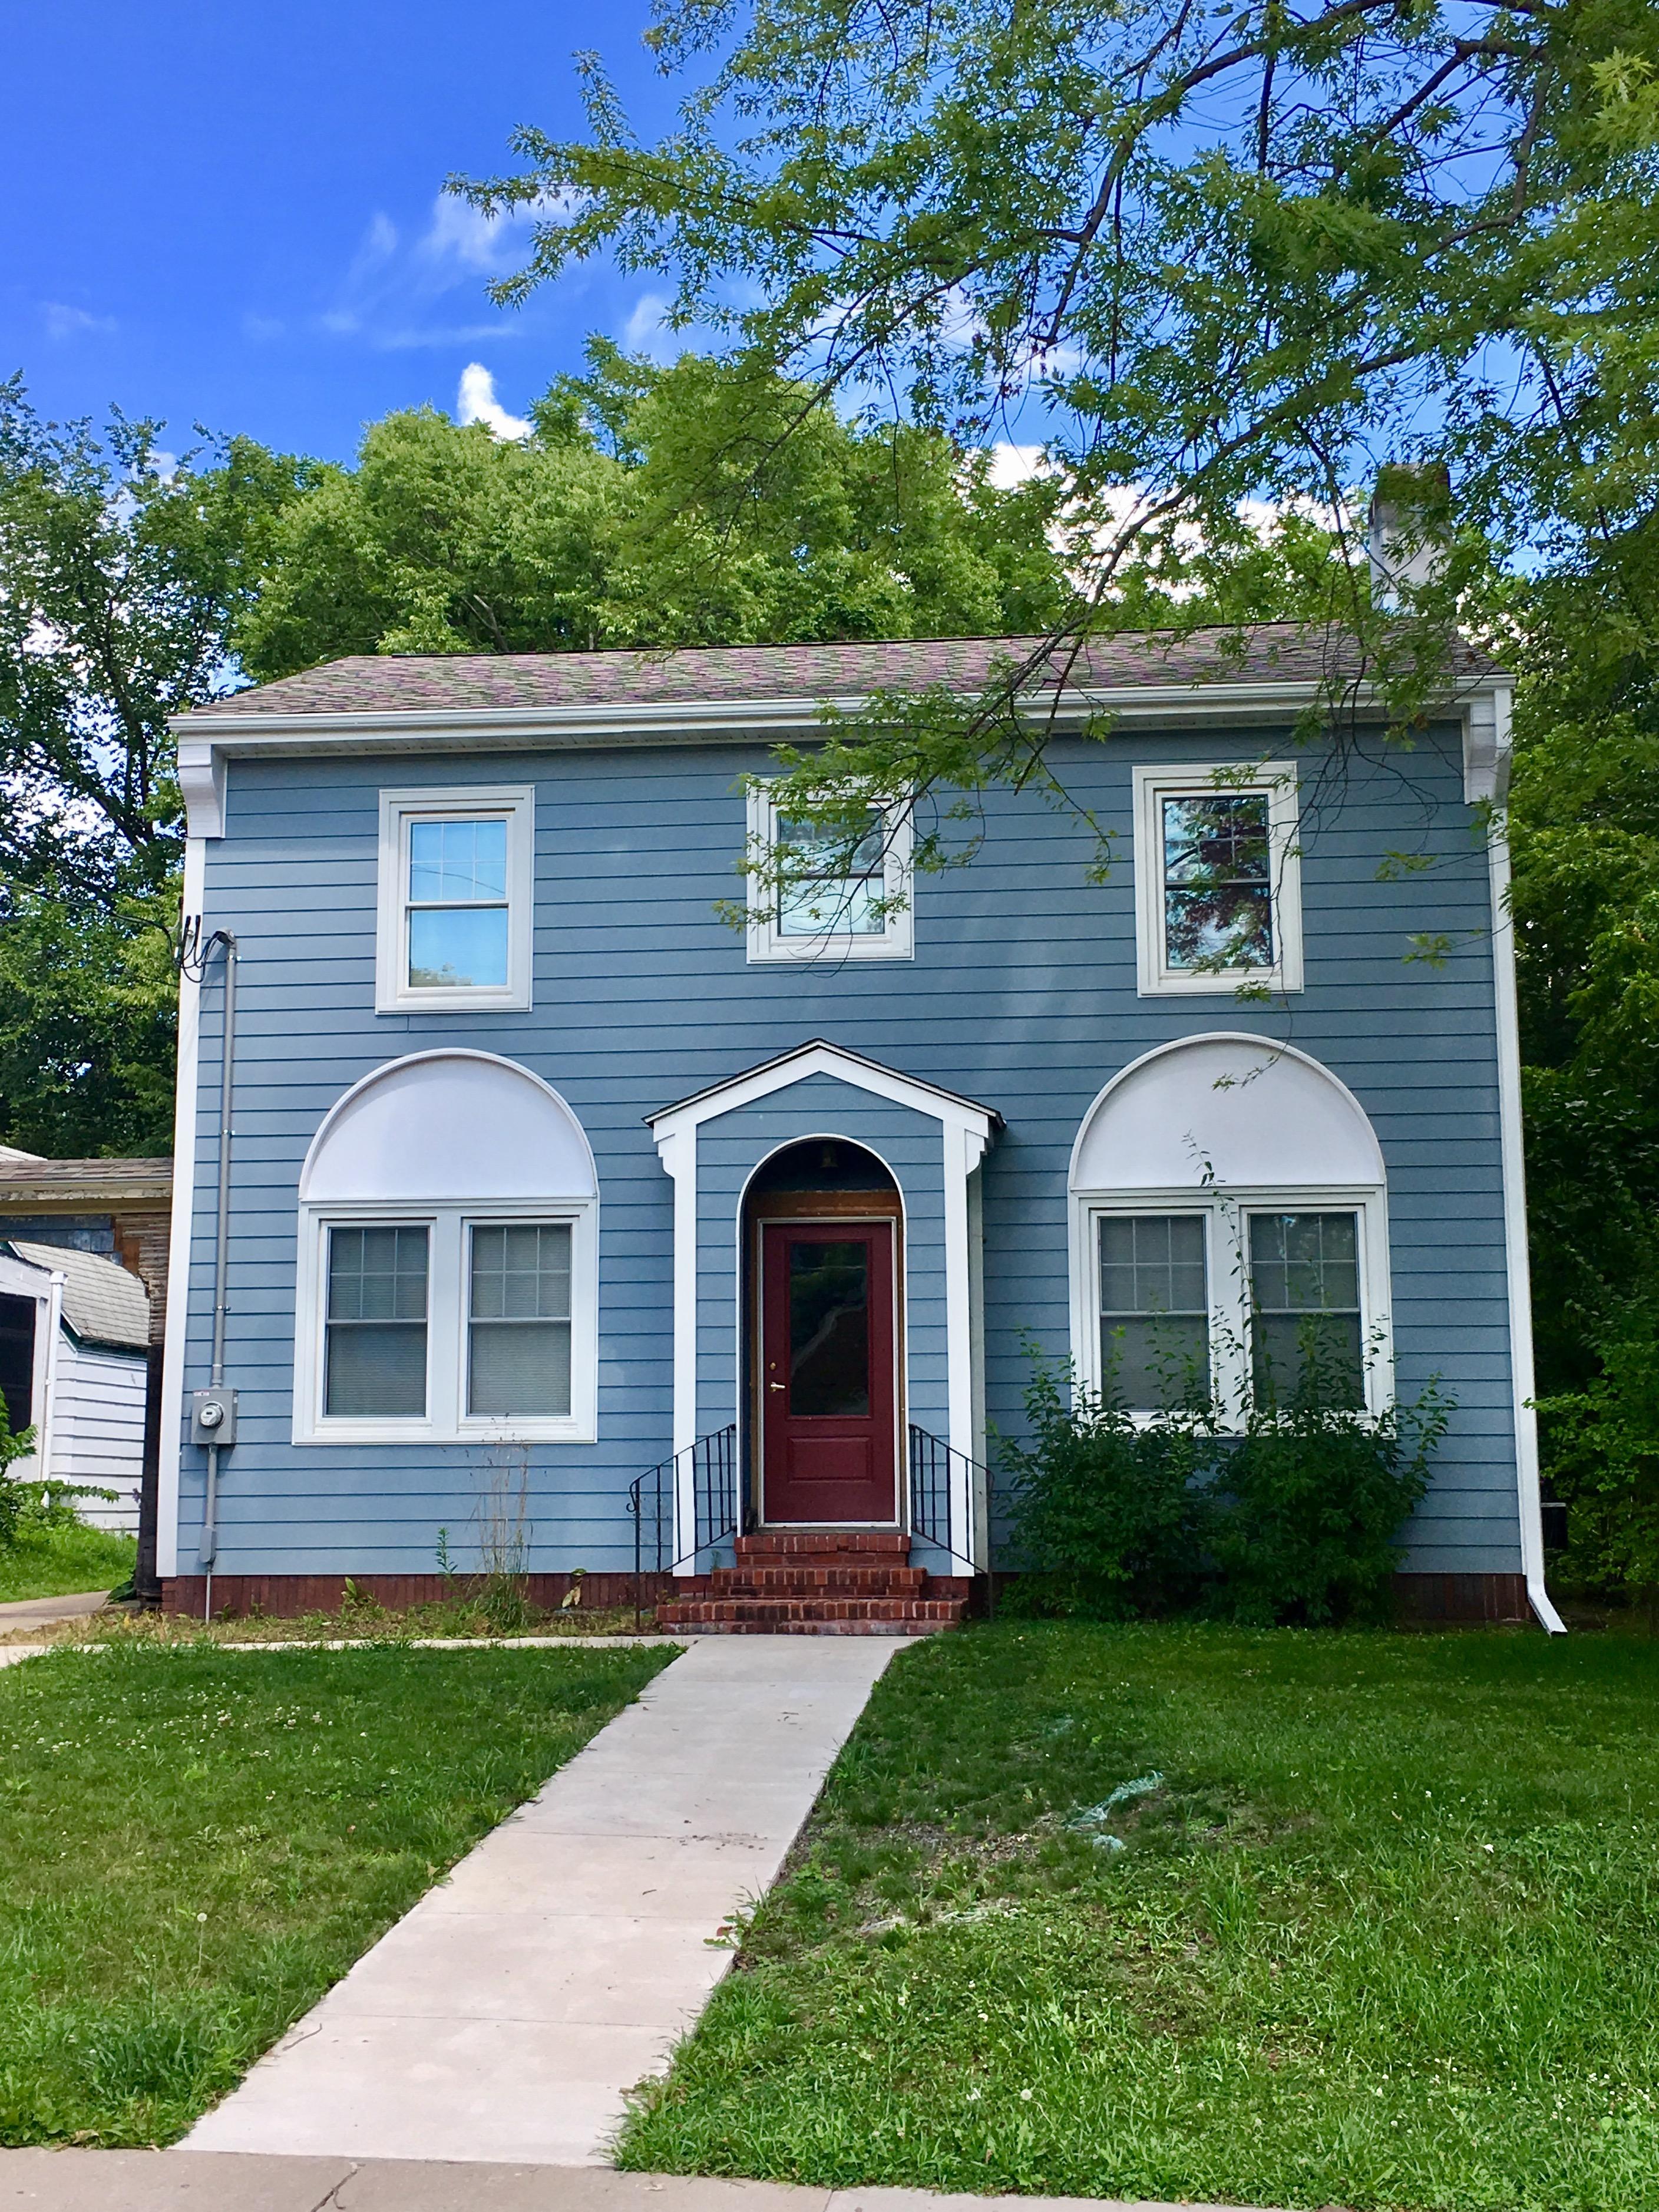 422 Melrose Court – 3 Bedroom AUGUST 2021